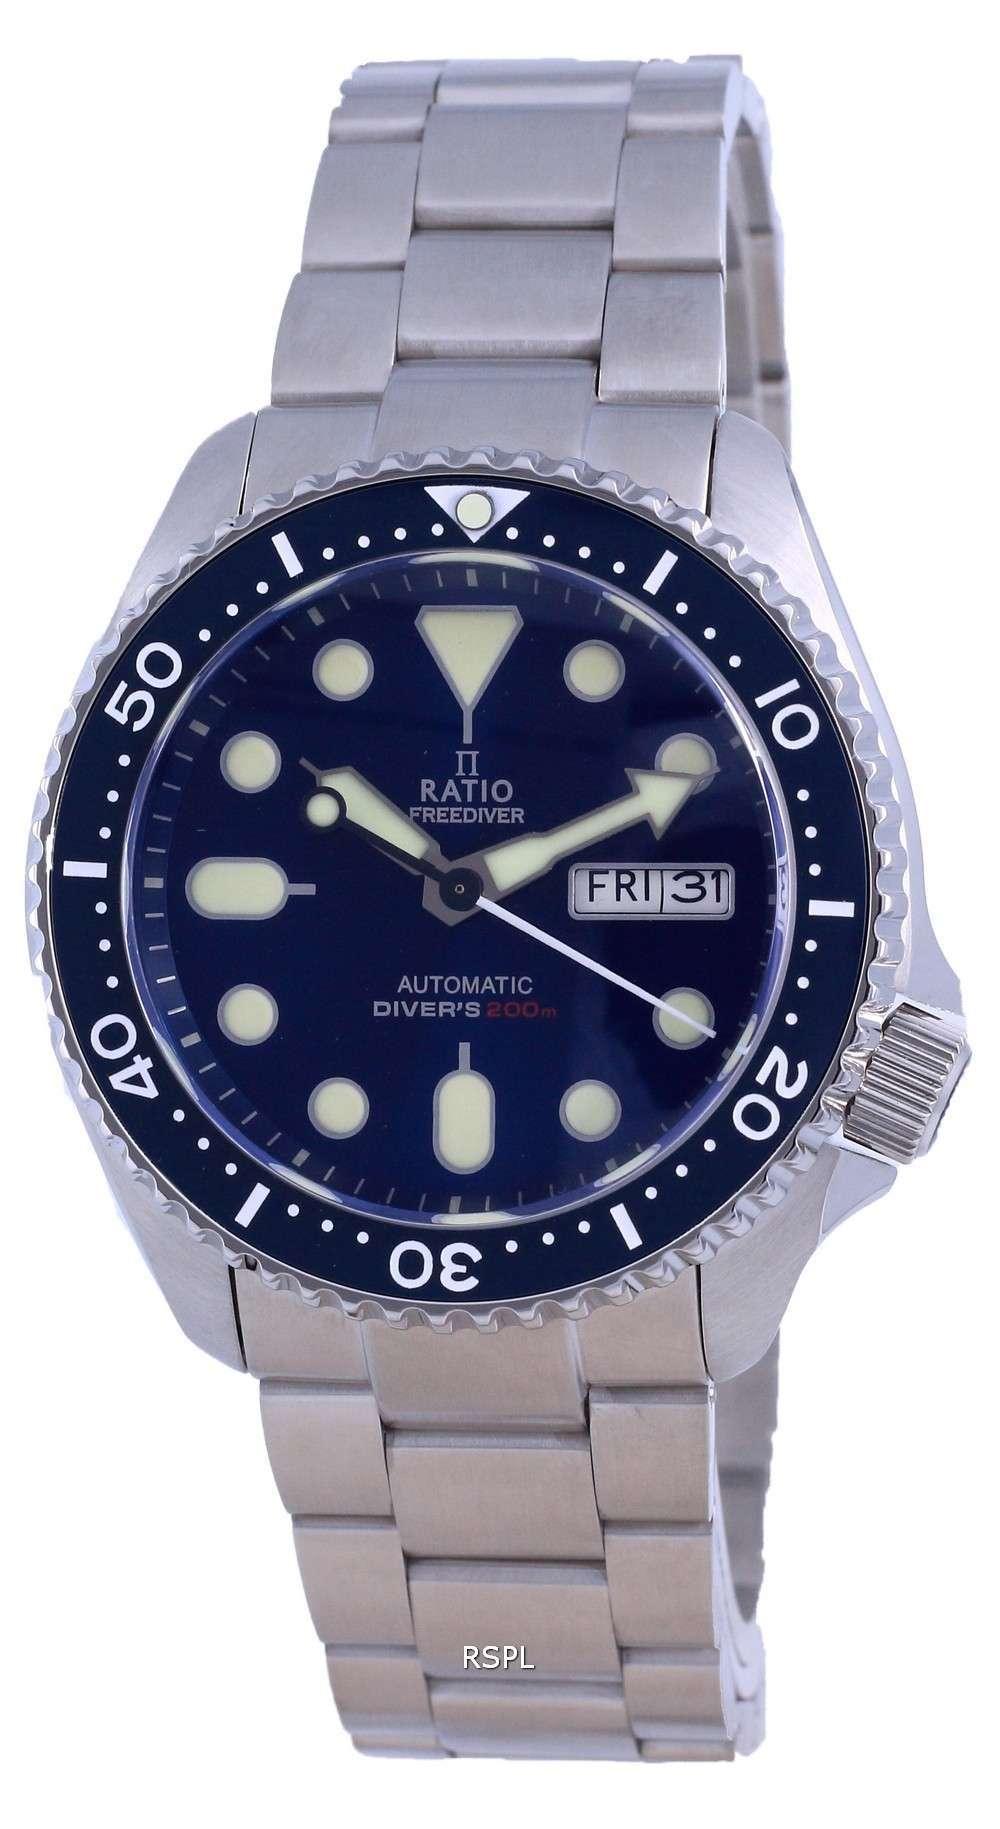 Ratio FreeDiver Dial azul Acero inoxidable Automático RTA102 200M Reloj para hombre